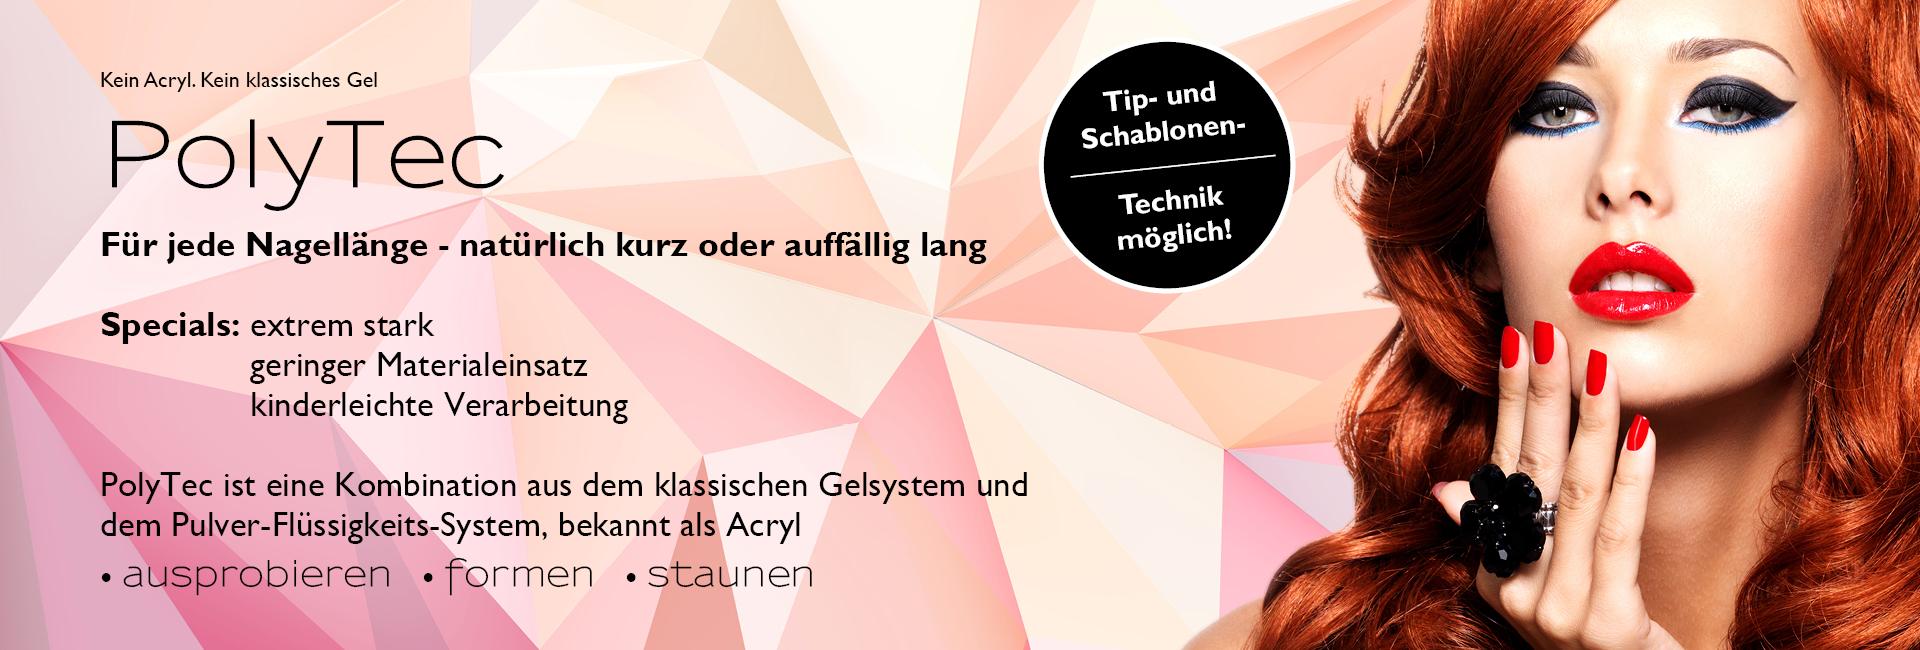 PolyTec_NBM Gelnhausen